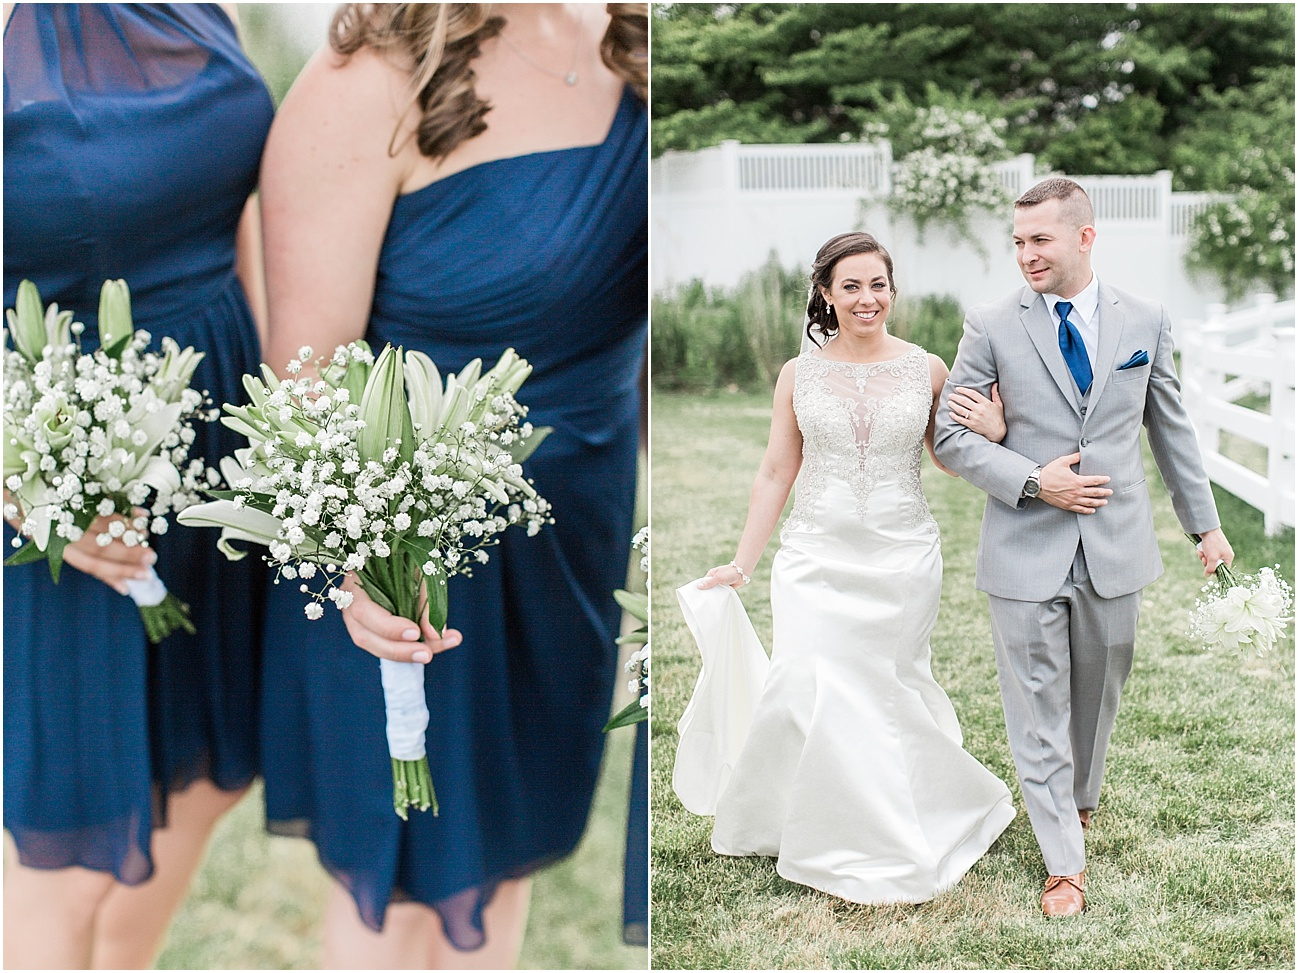 nicole_stephen_cape_club_nicky_falmouth_cod_boston_wedding_photographer_meredith_jane_photography_photo_0181.jpg